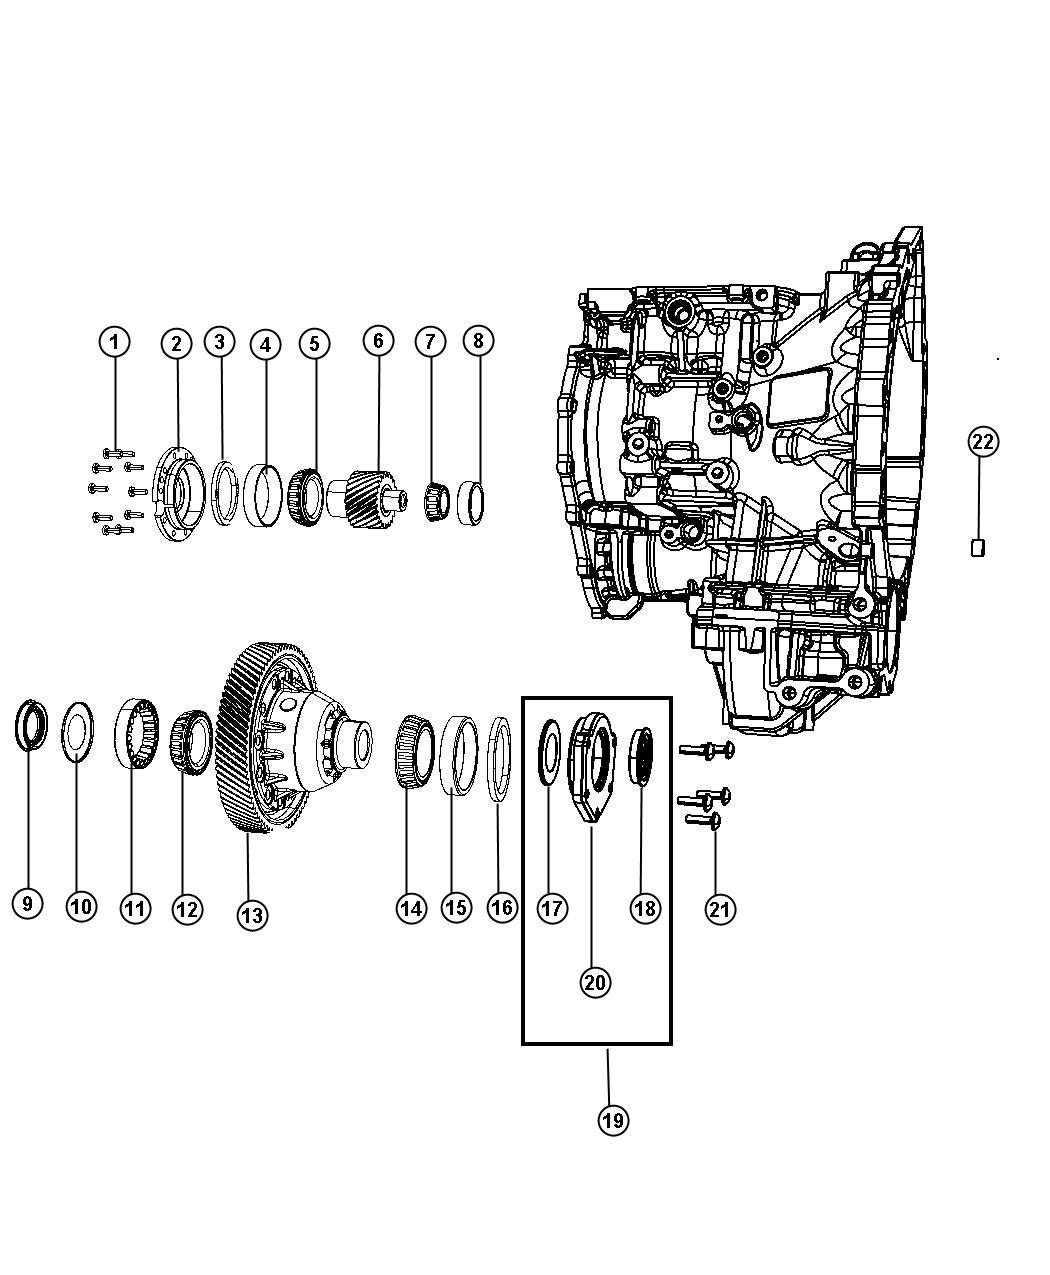 2007 chrysler sebring bumper cover parts diagram  chrysler